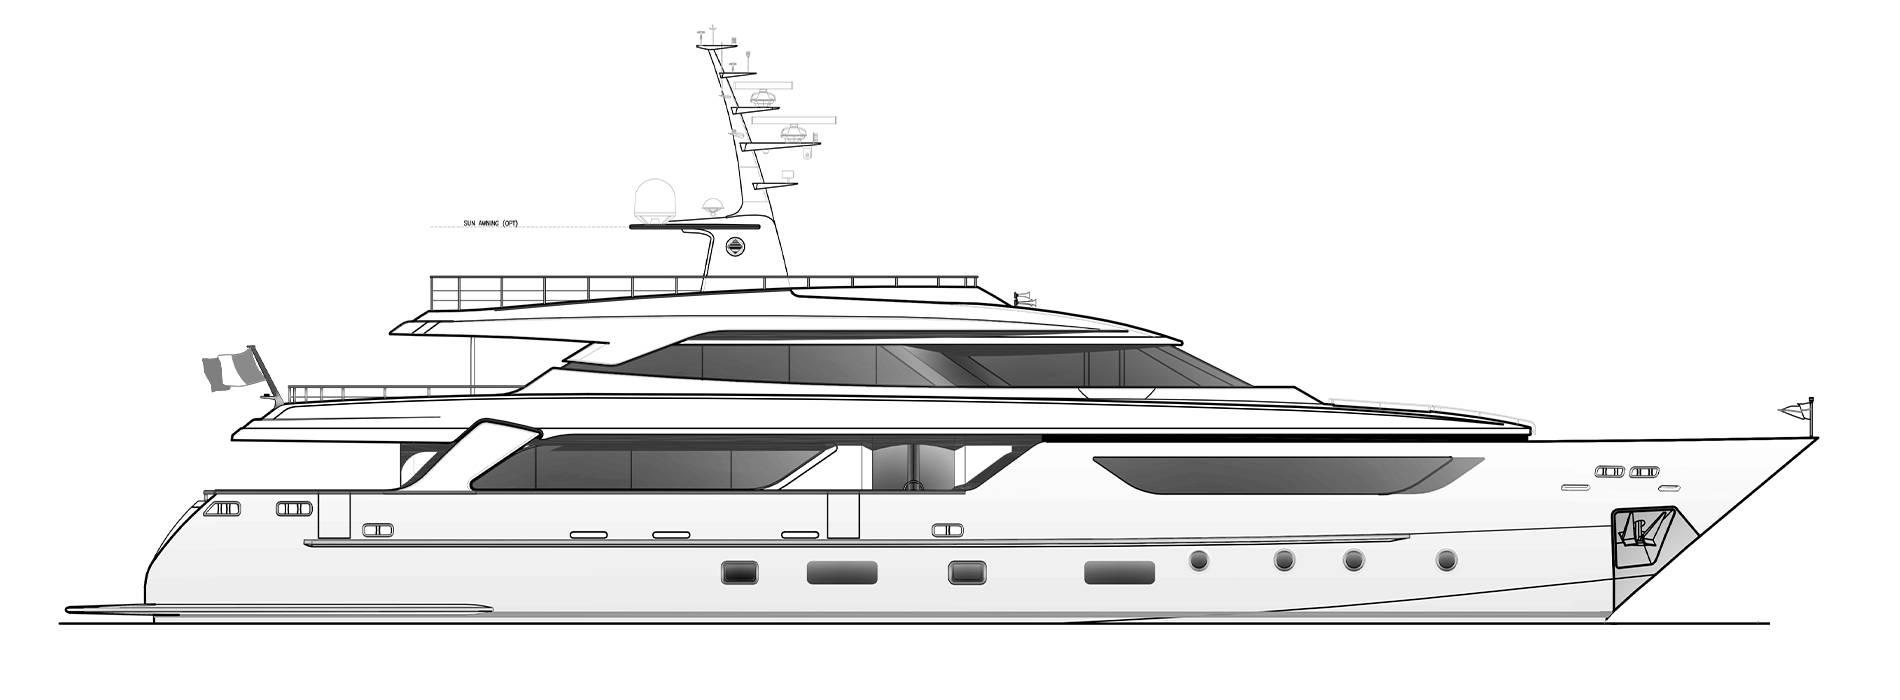 Sanlorenzo Yachts SD122-27 under offer Profilo